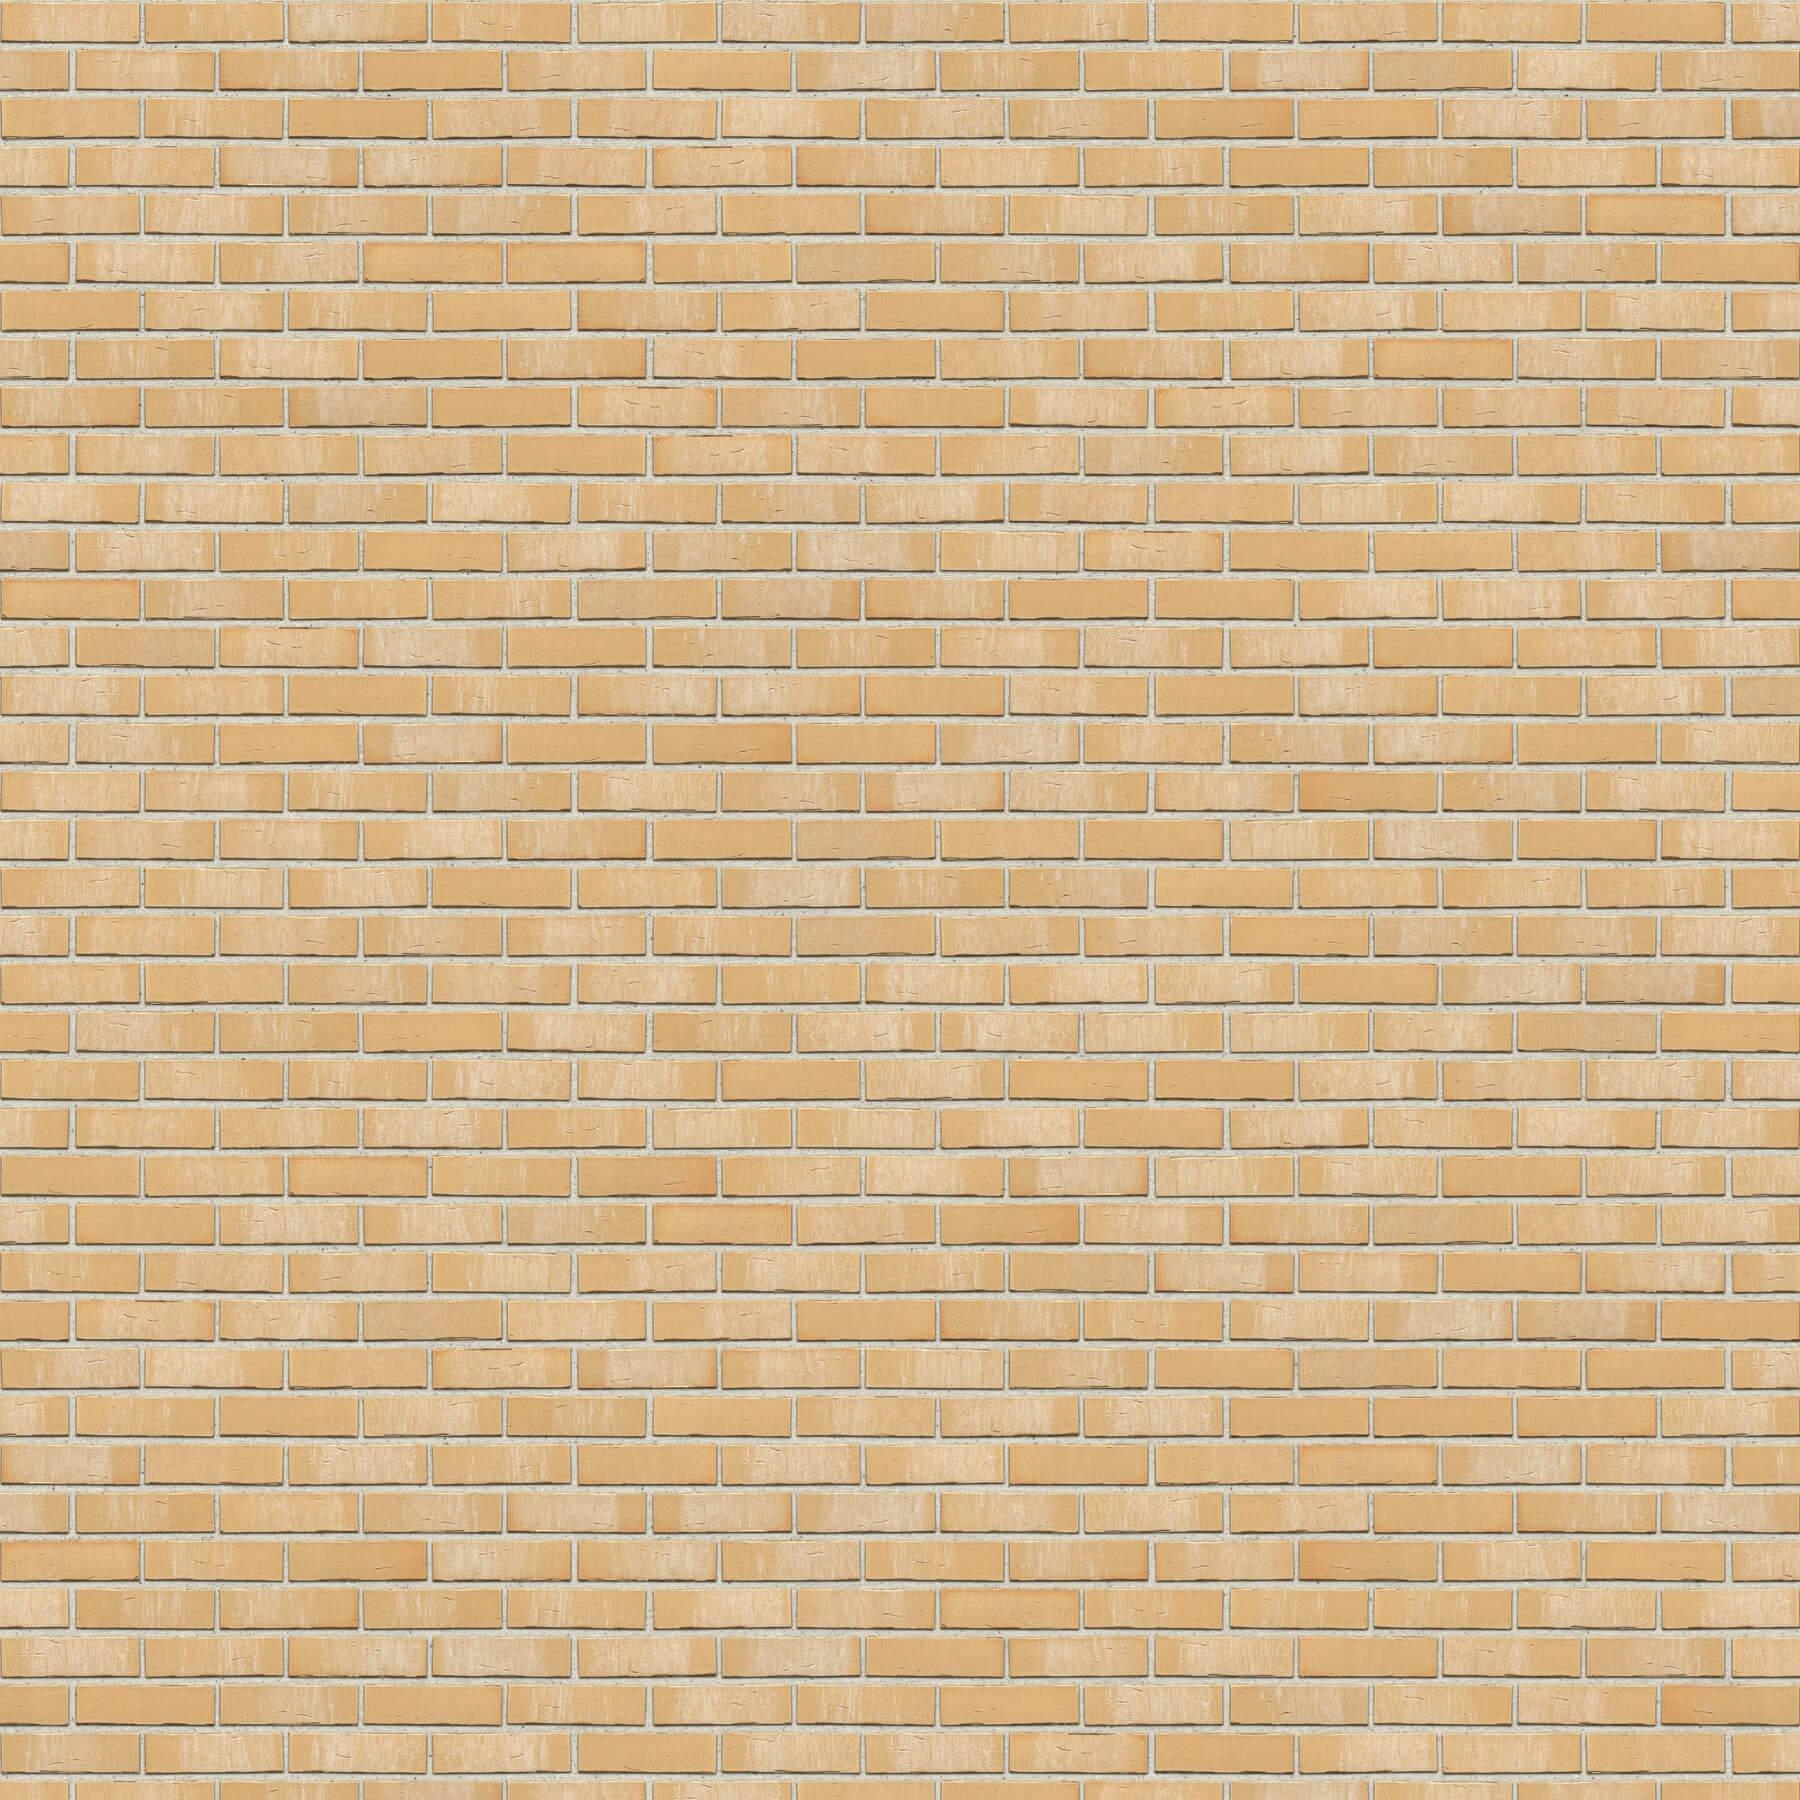 Dekorativna cigla listela FeldHaus Klinker r-756 nf Bela